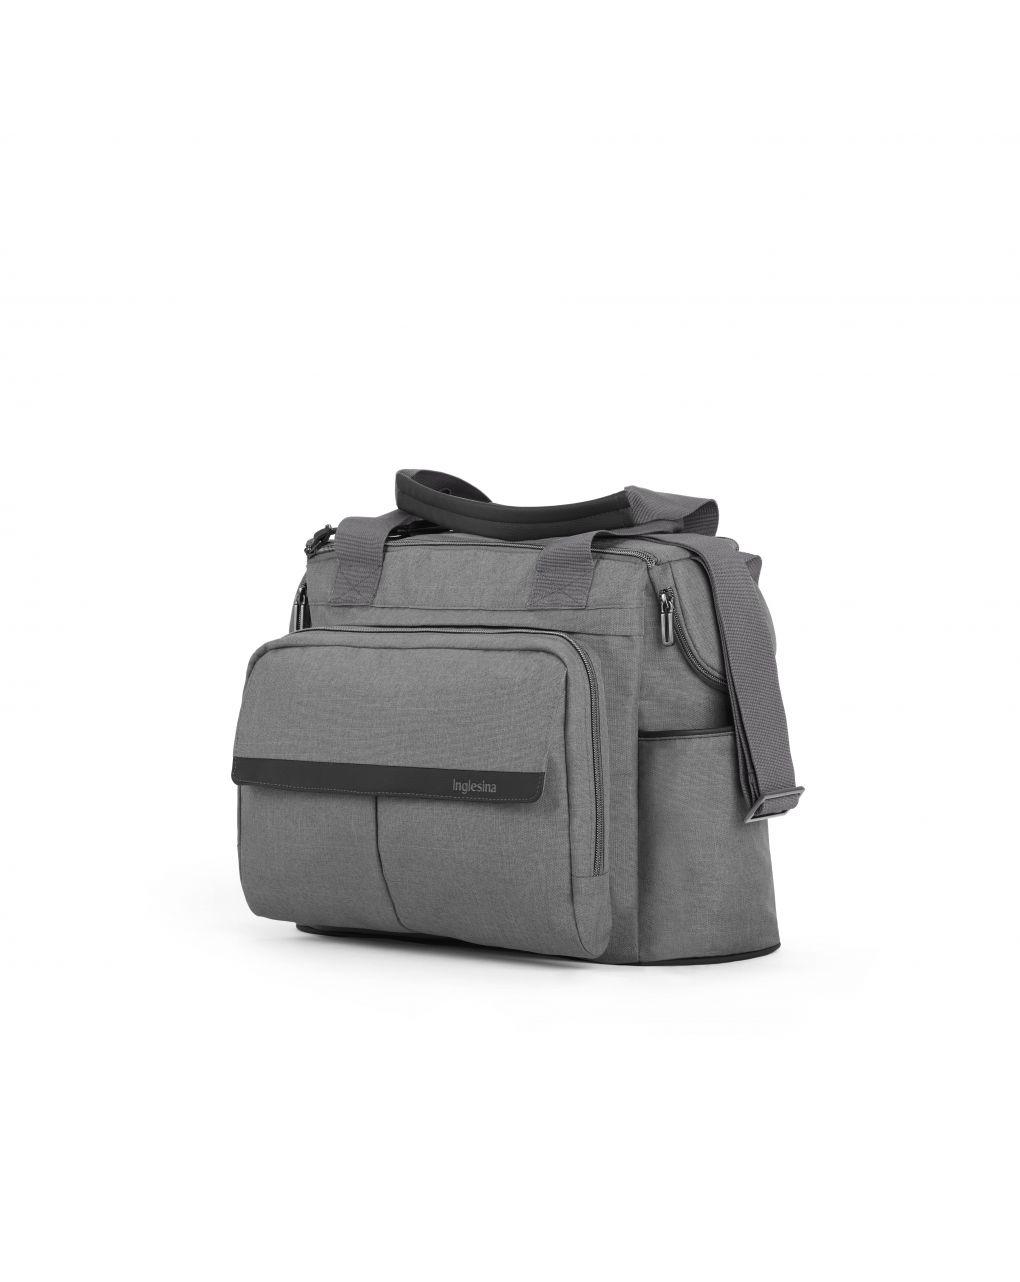 Inglesina aptica dual bag, kensington grey - Inglesina